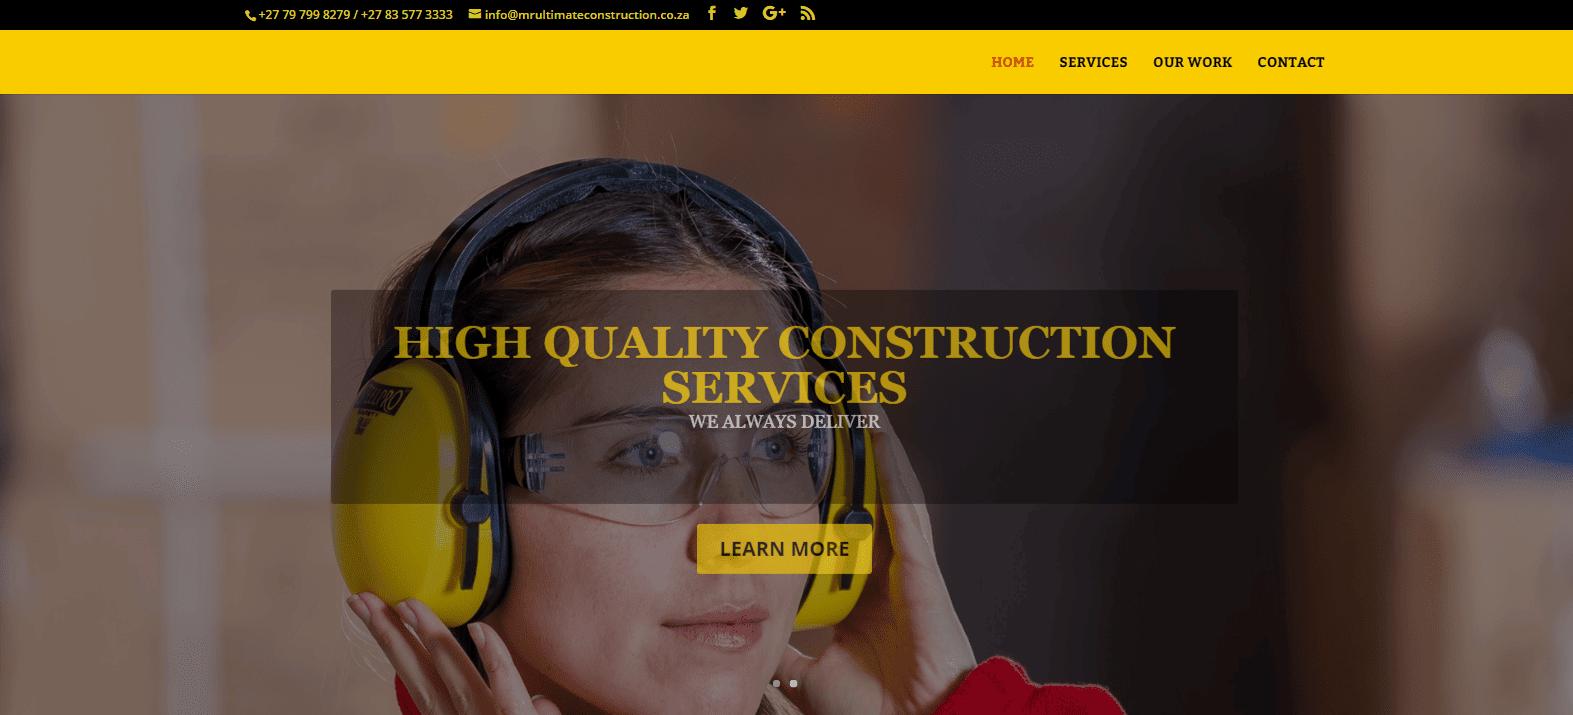 Mr Ultimate Construction - Website